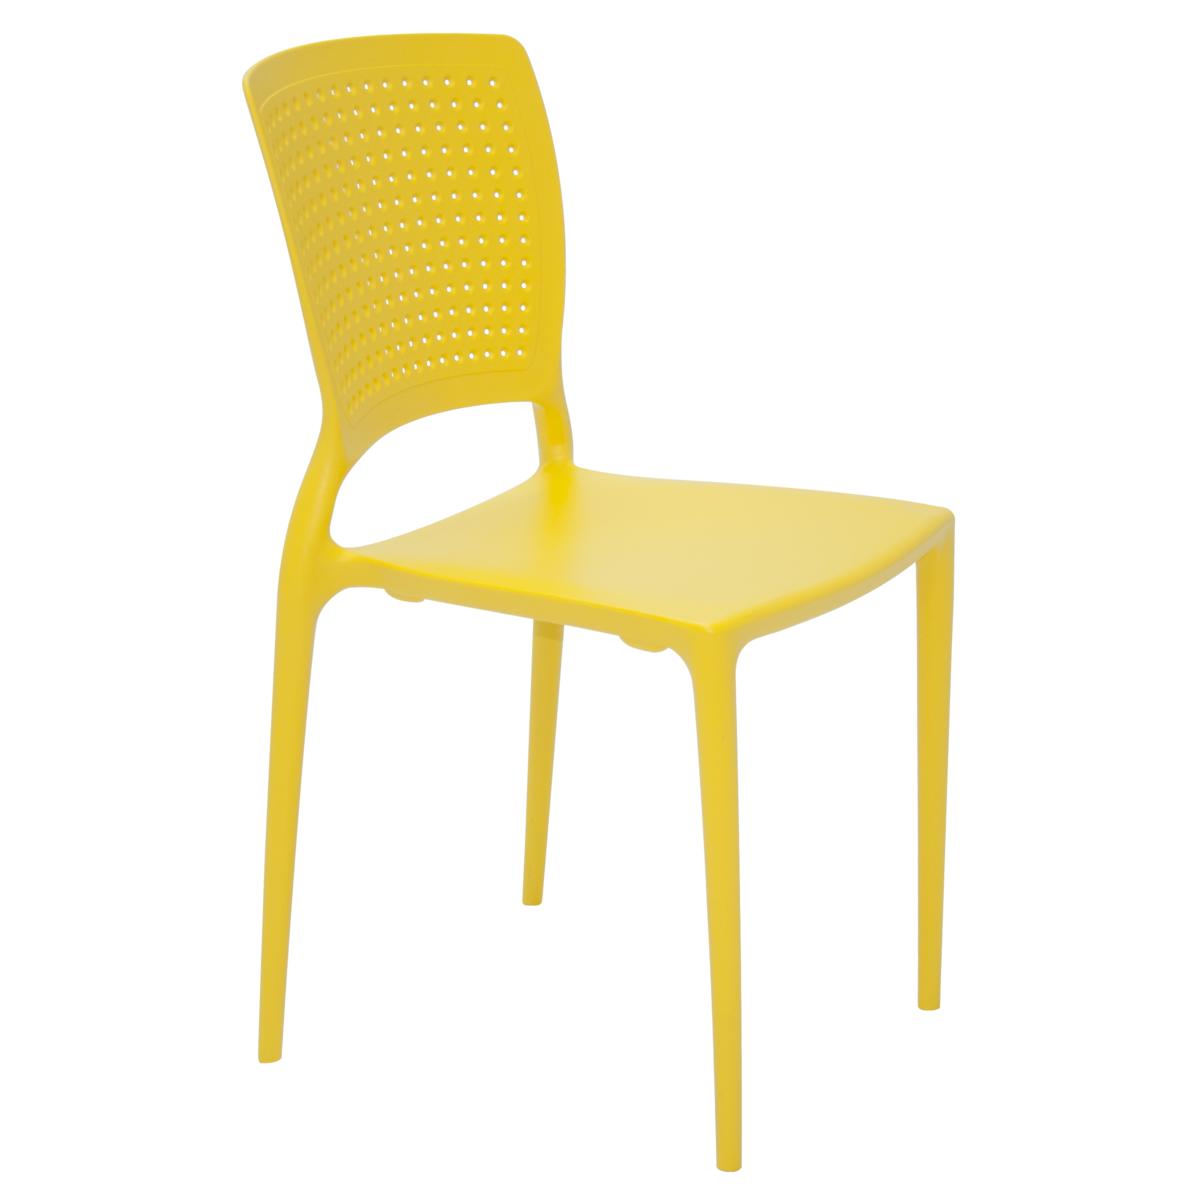 Cadeira Tramontina Safira Summa Amarelo 92048/000 1 Peça